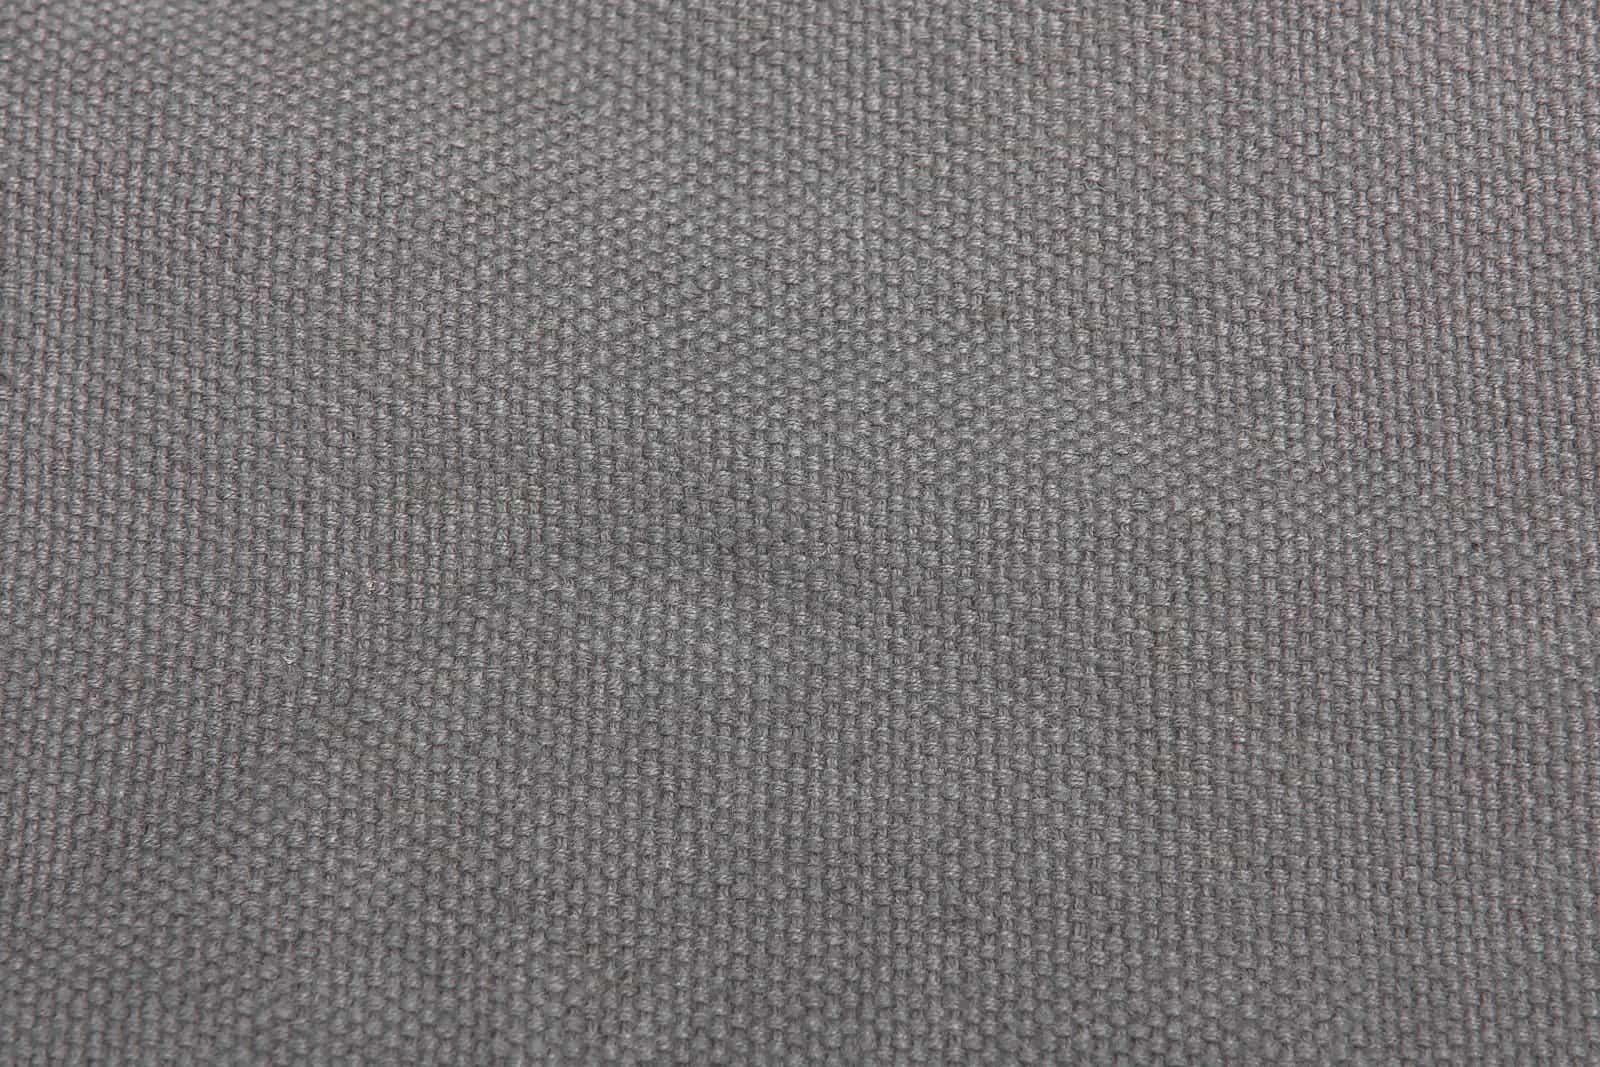 hangmat | antraciet grijs | 2 persoons | BIO katoen | GOTS | ecomundy pure XL 360